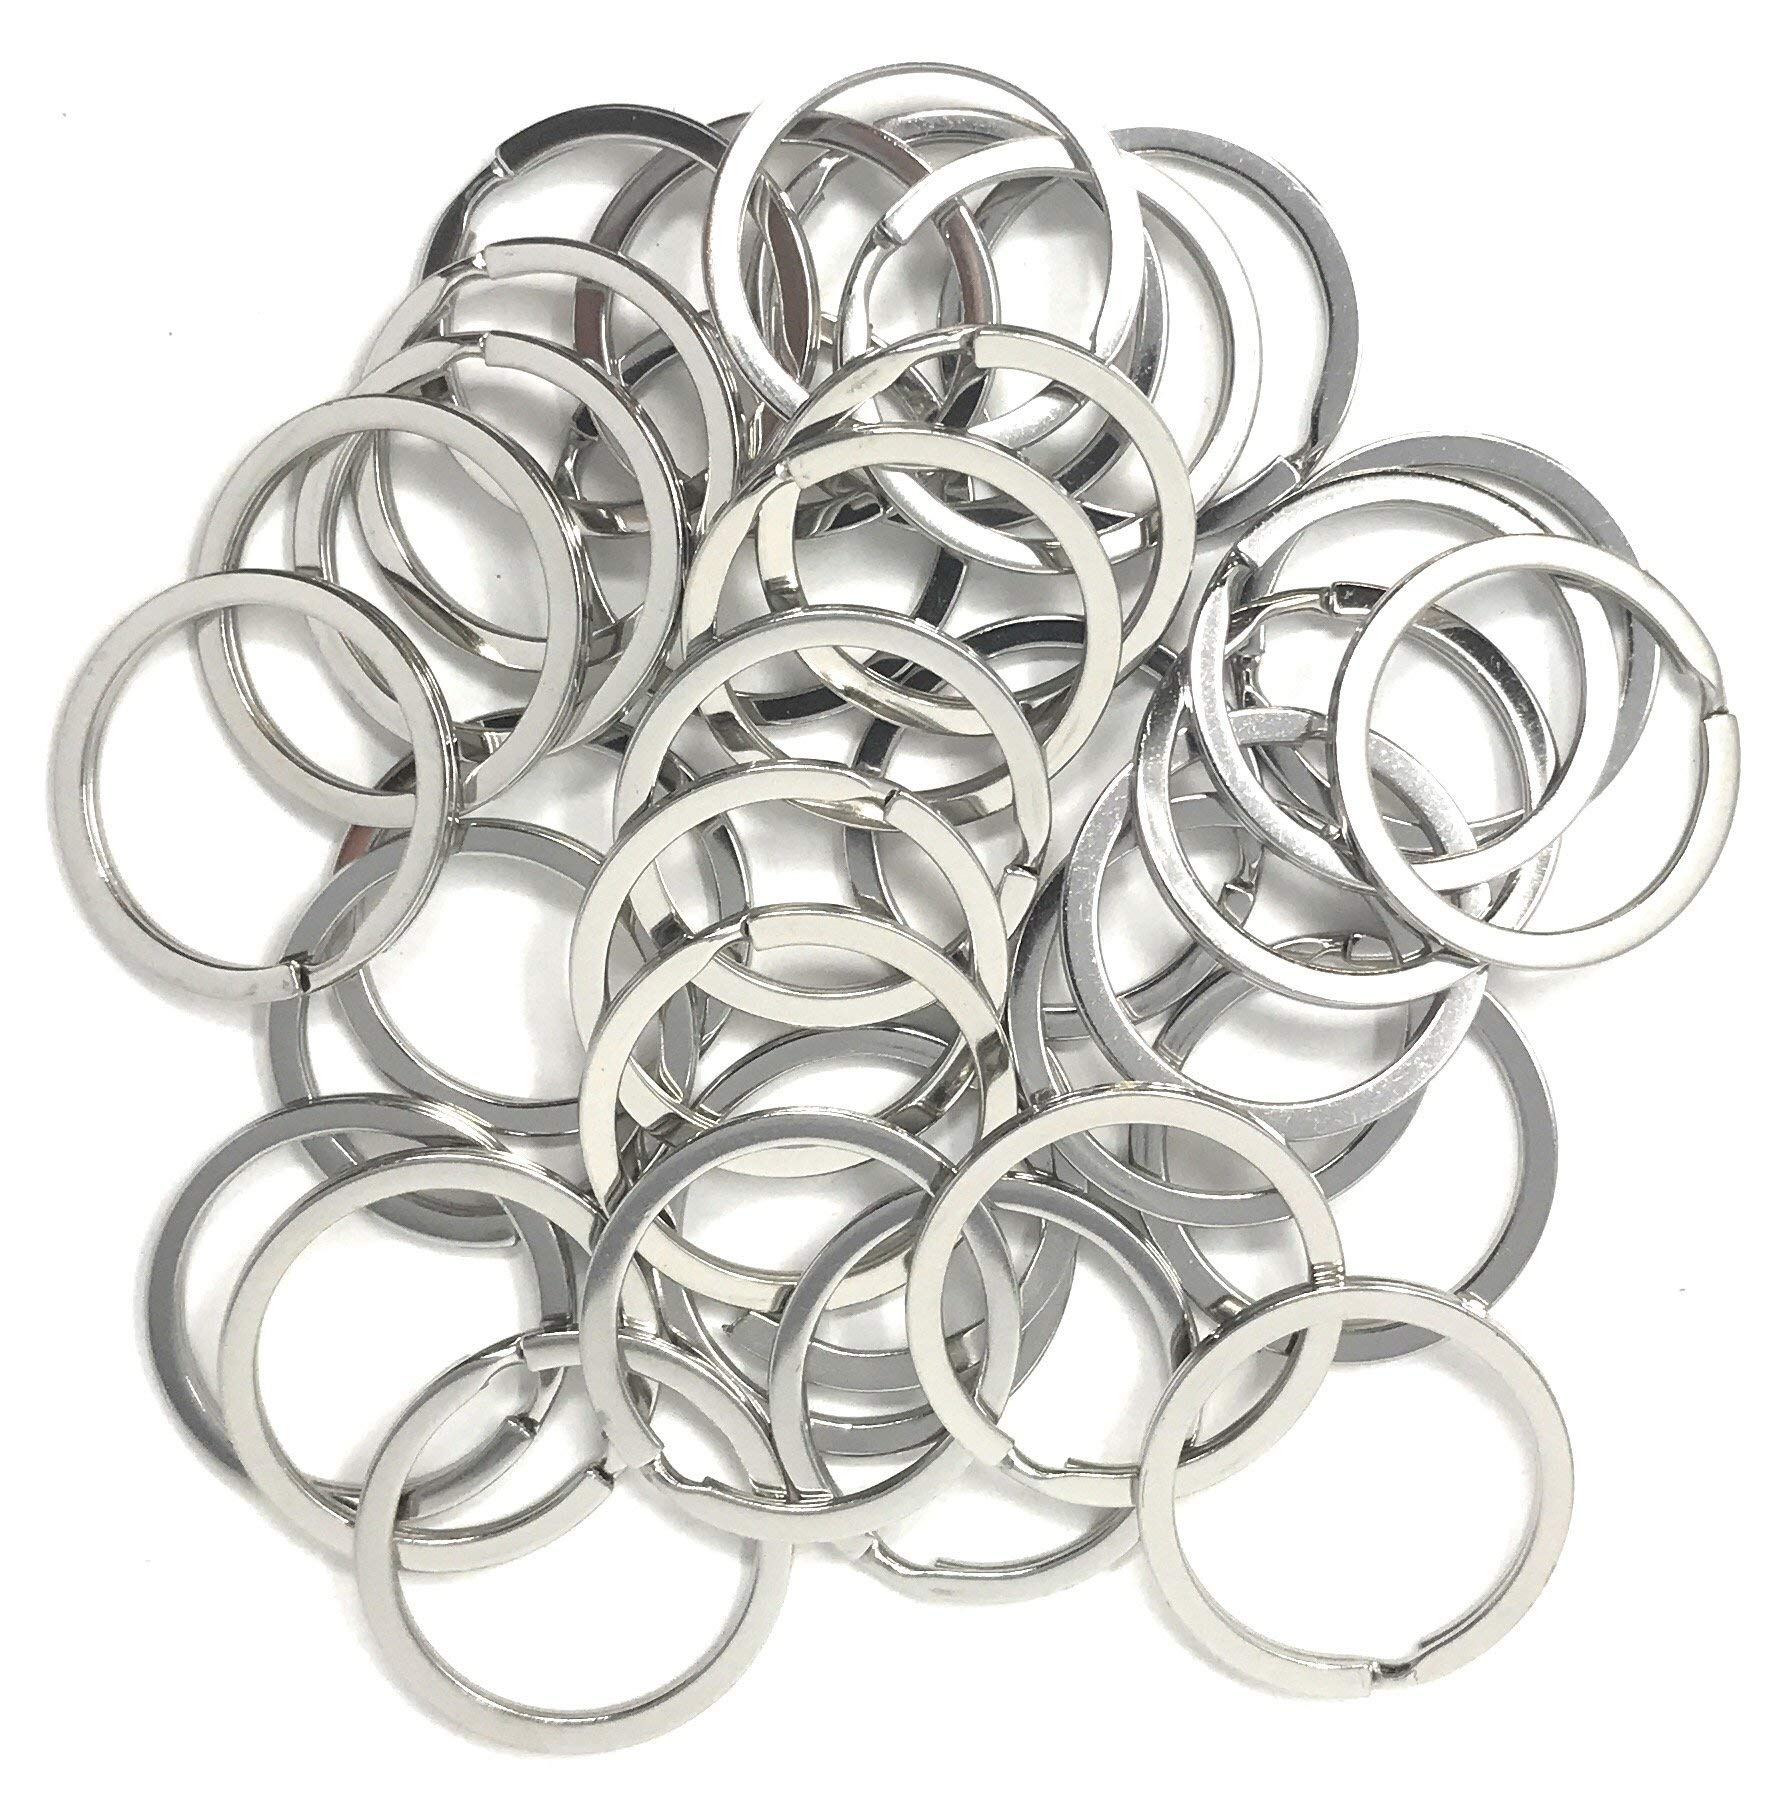 1000 Bulk 1.25'' Large Stainless Steel Key Ring Findings/Jump Rings